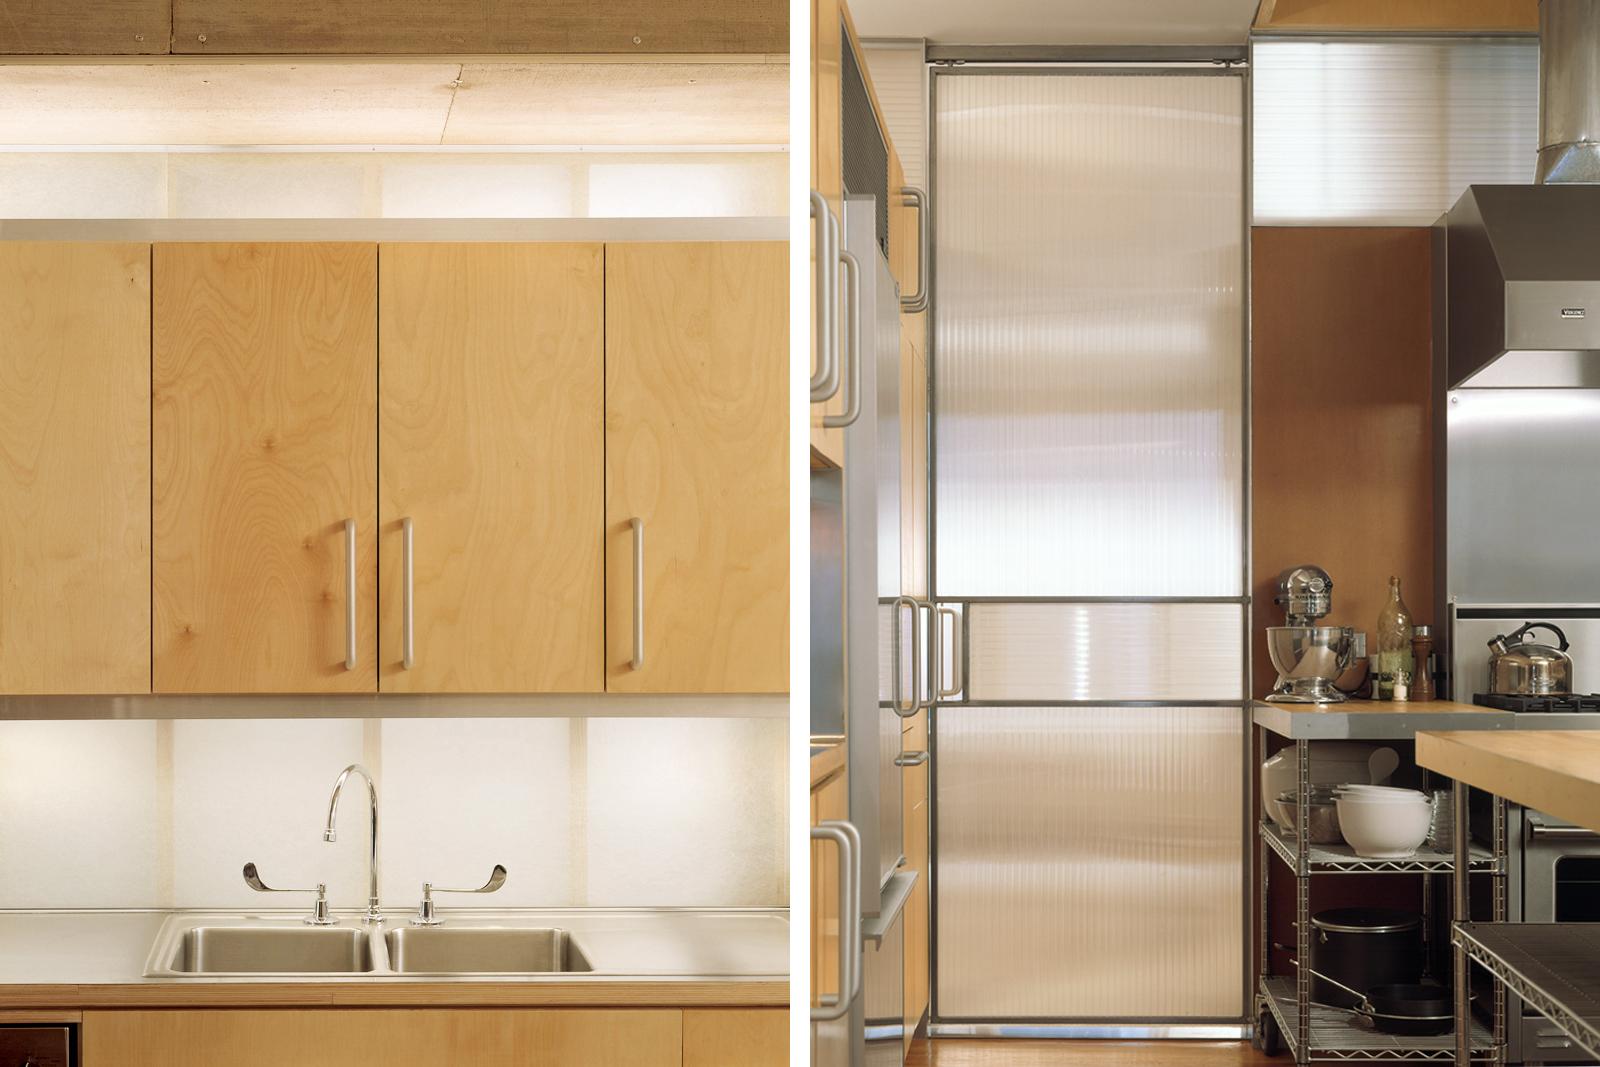 03-res4-resolution-4-architecture-modern-apartment-residential-rons-loft-interior-kitchen.jpg